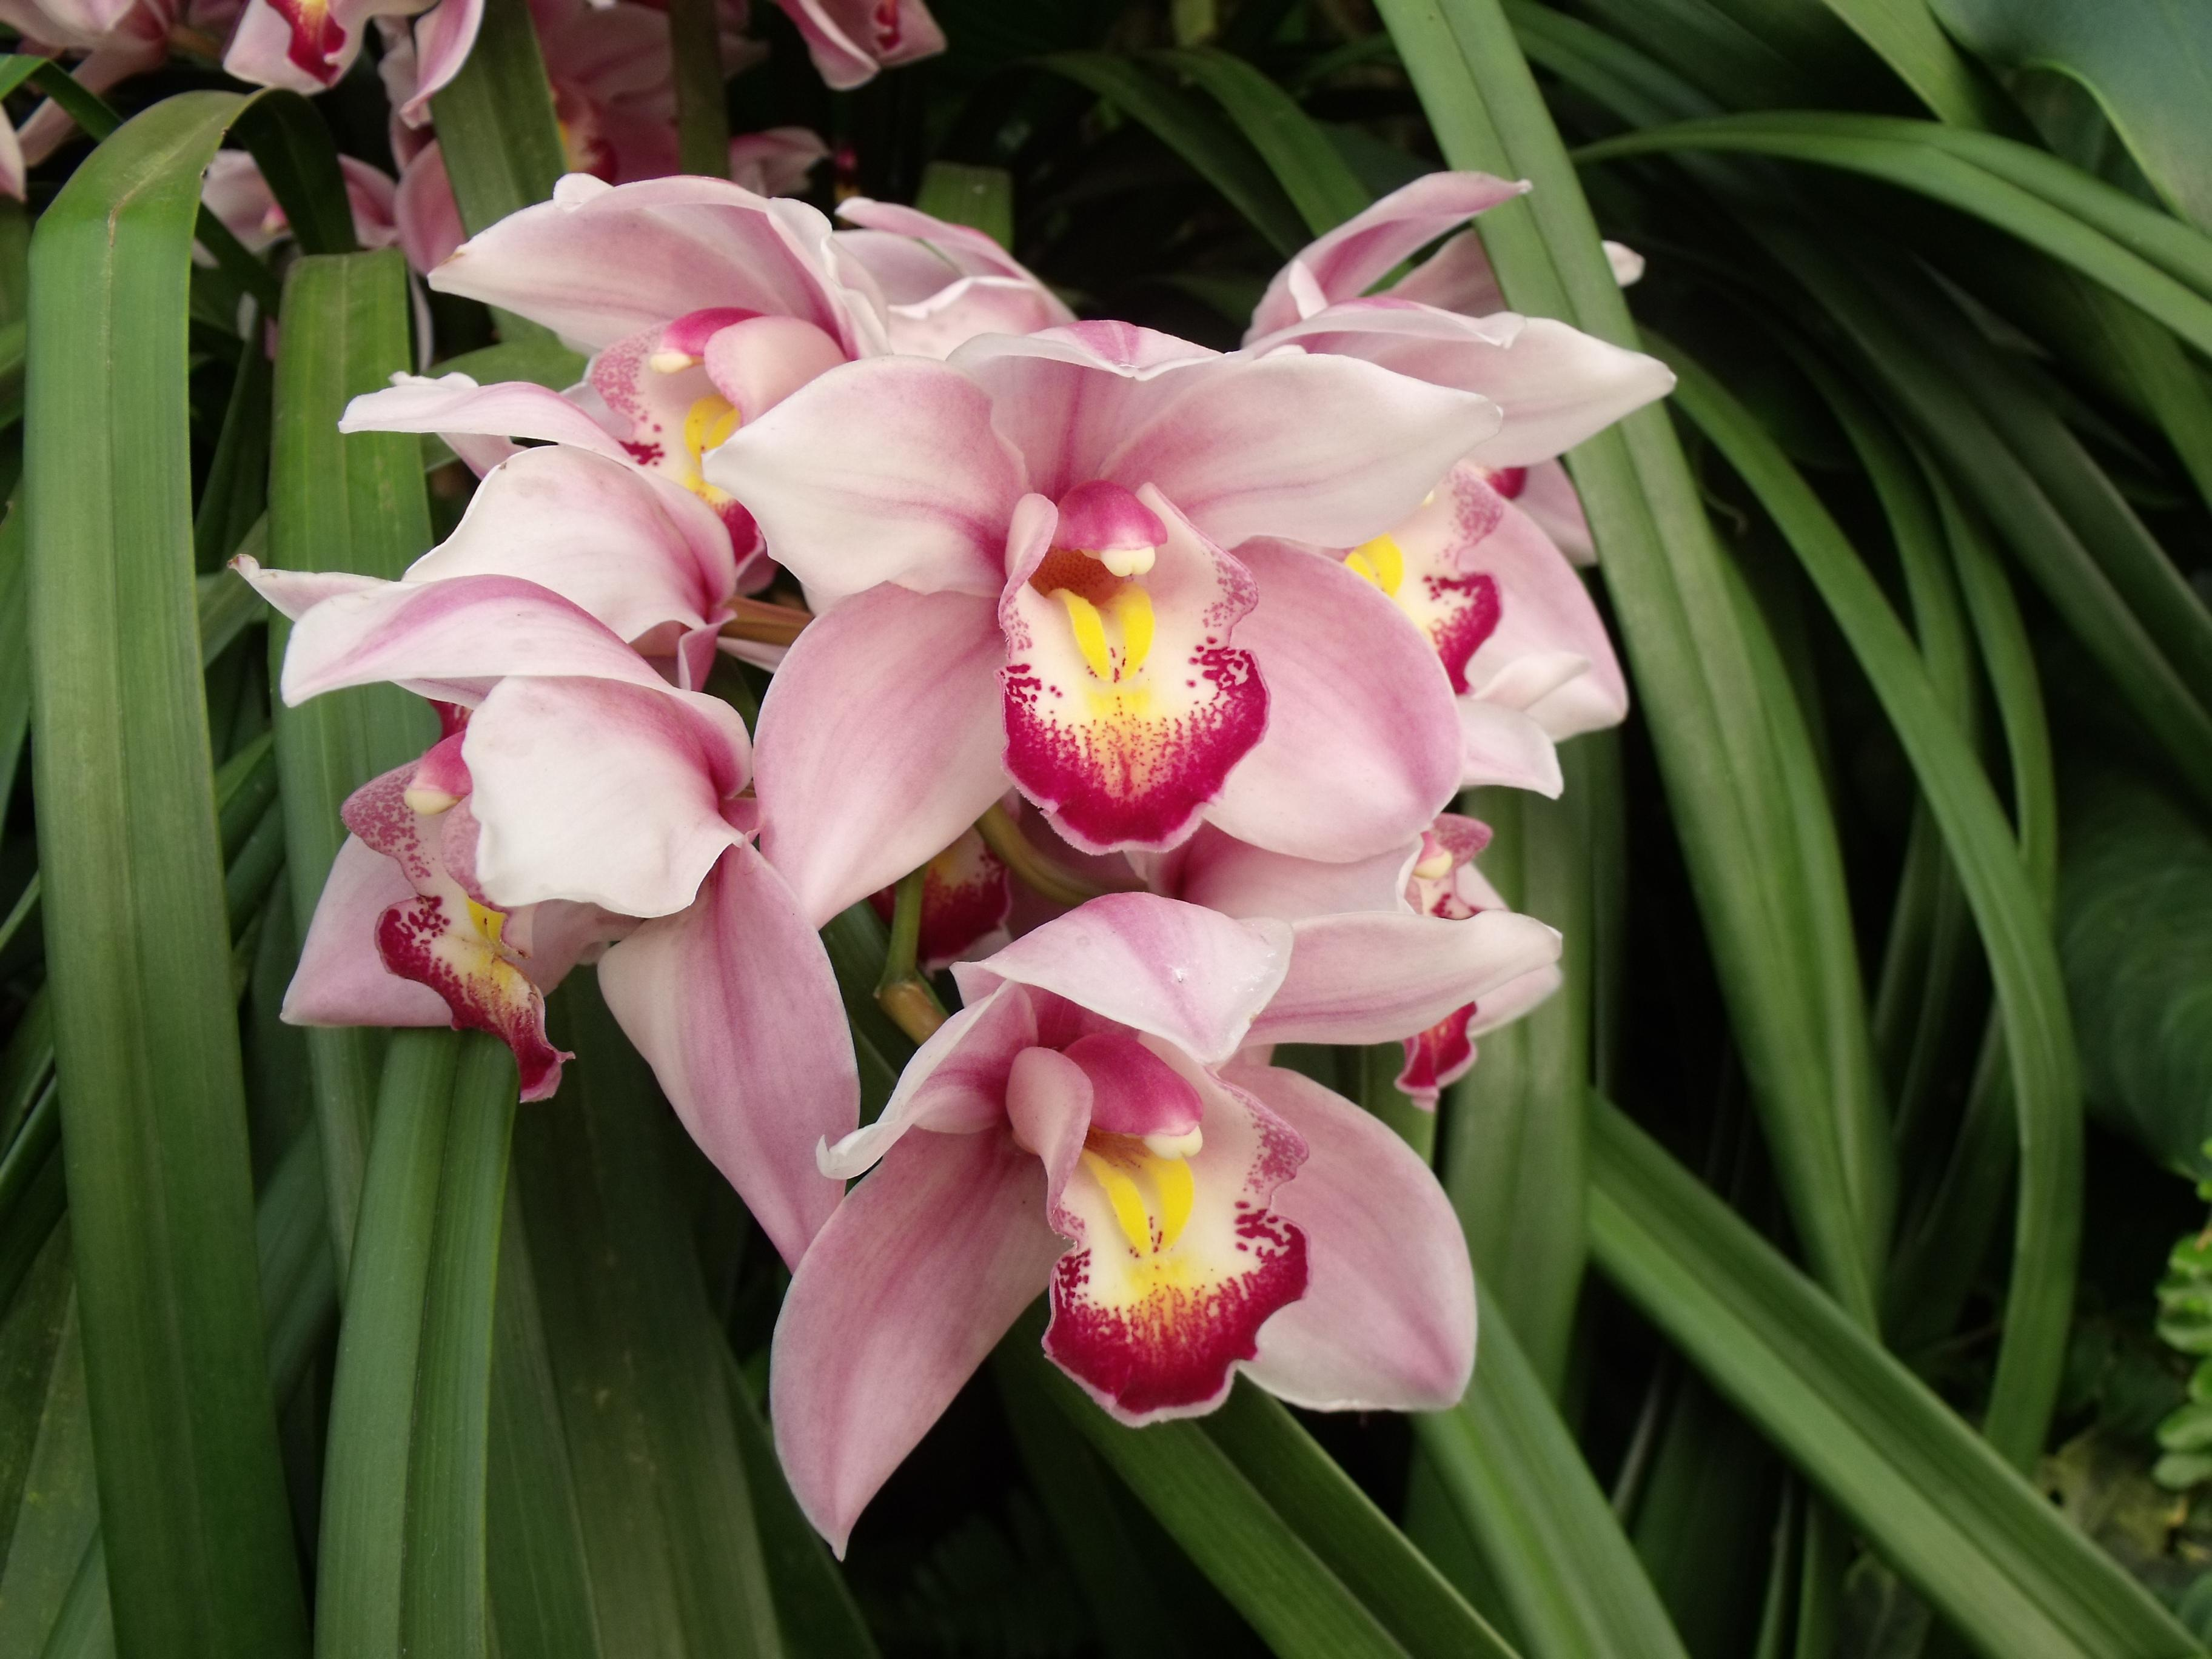 gro es fotoalbum f r orchideen. Black Bedroom Furniture Sets. Home Design Ideas